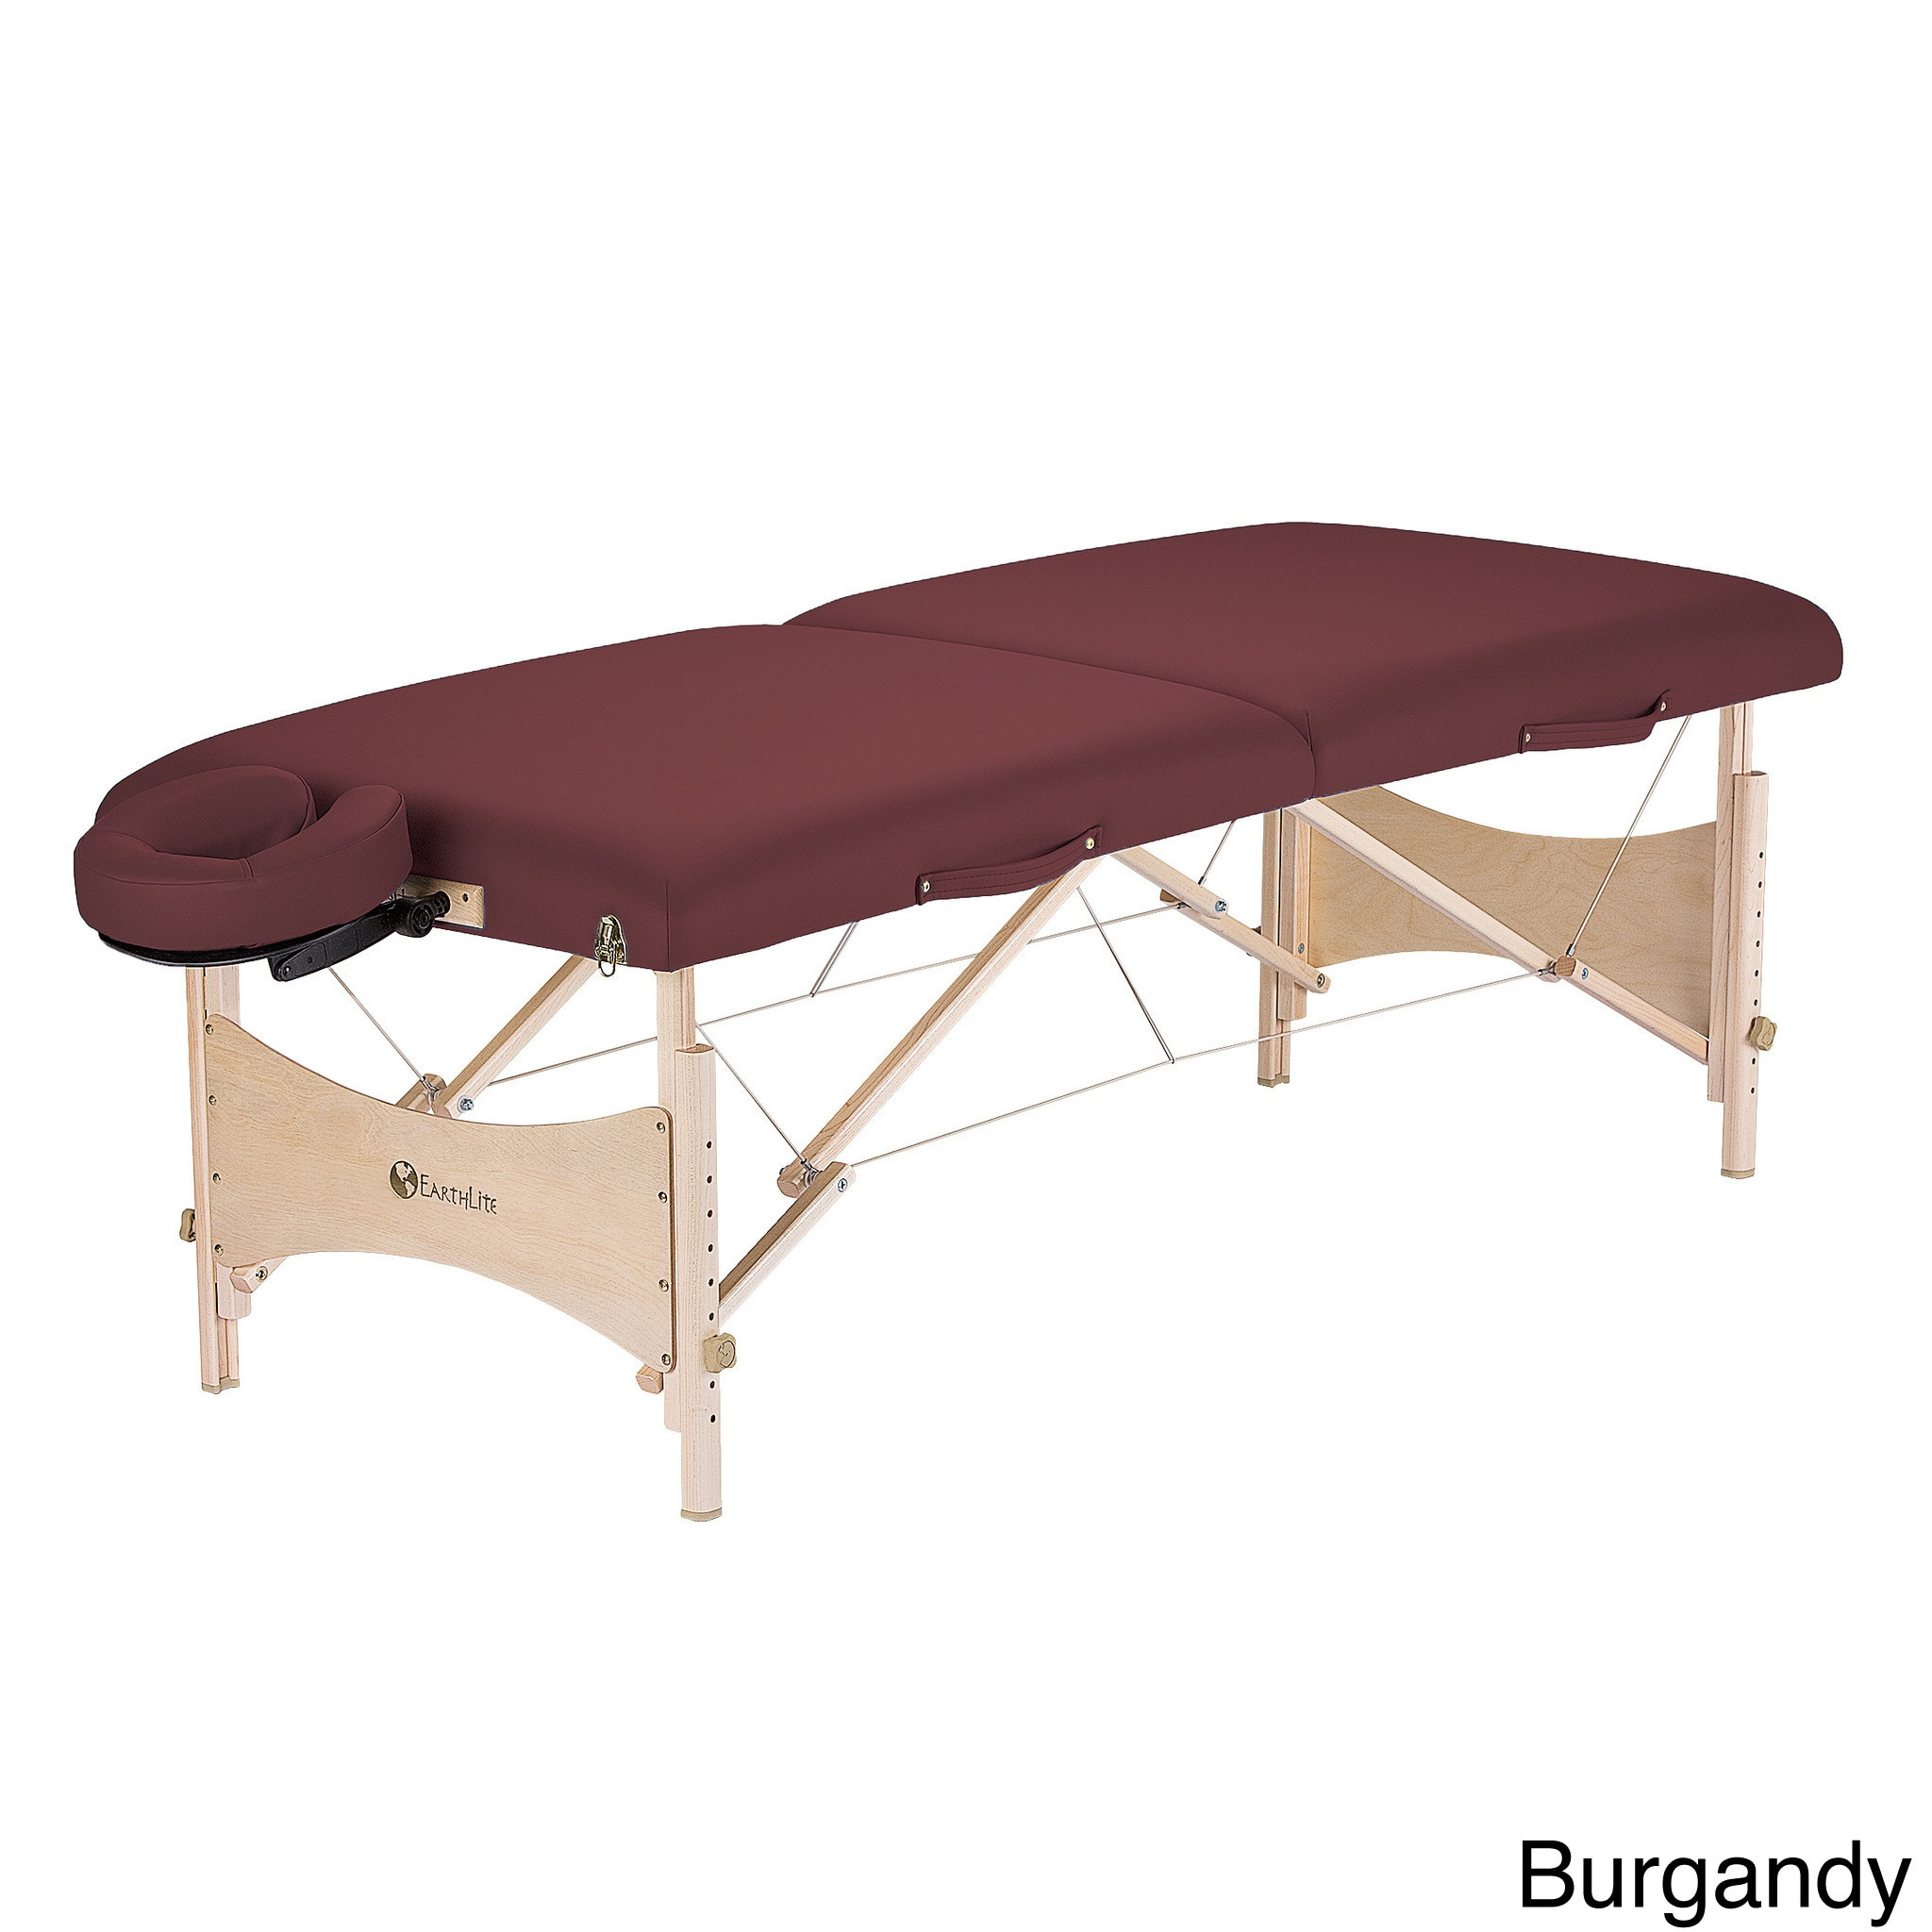 Earthlite Harmony Table Package (Burgundy (Red))